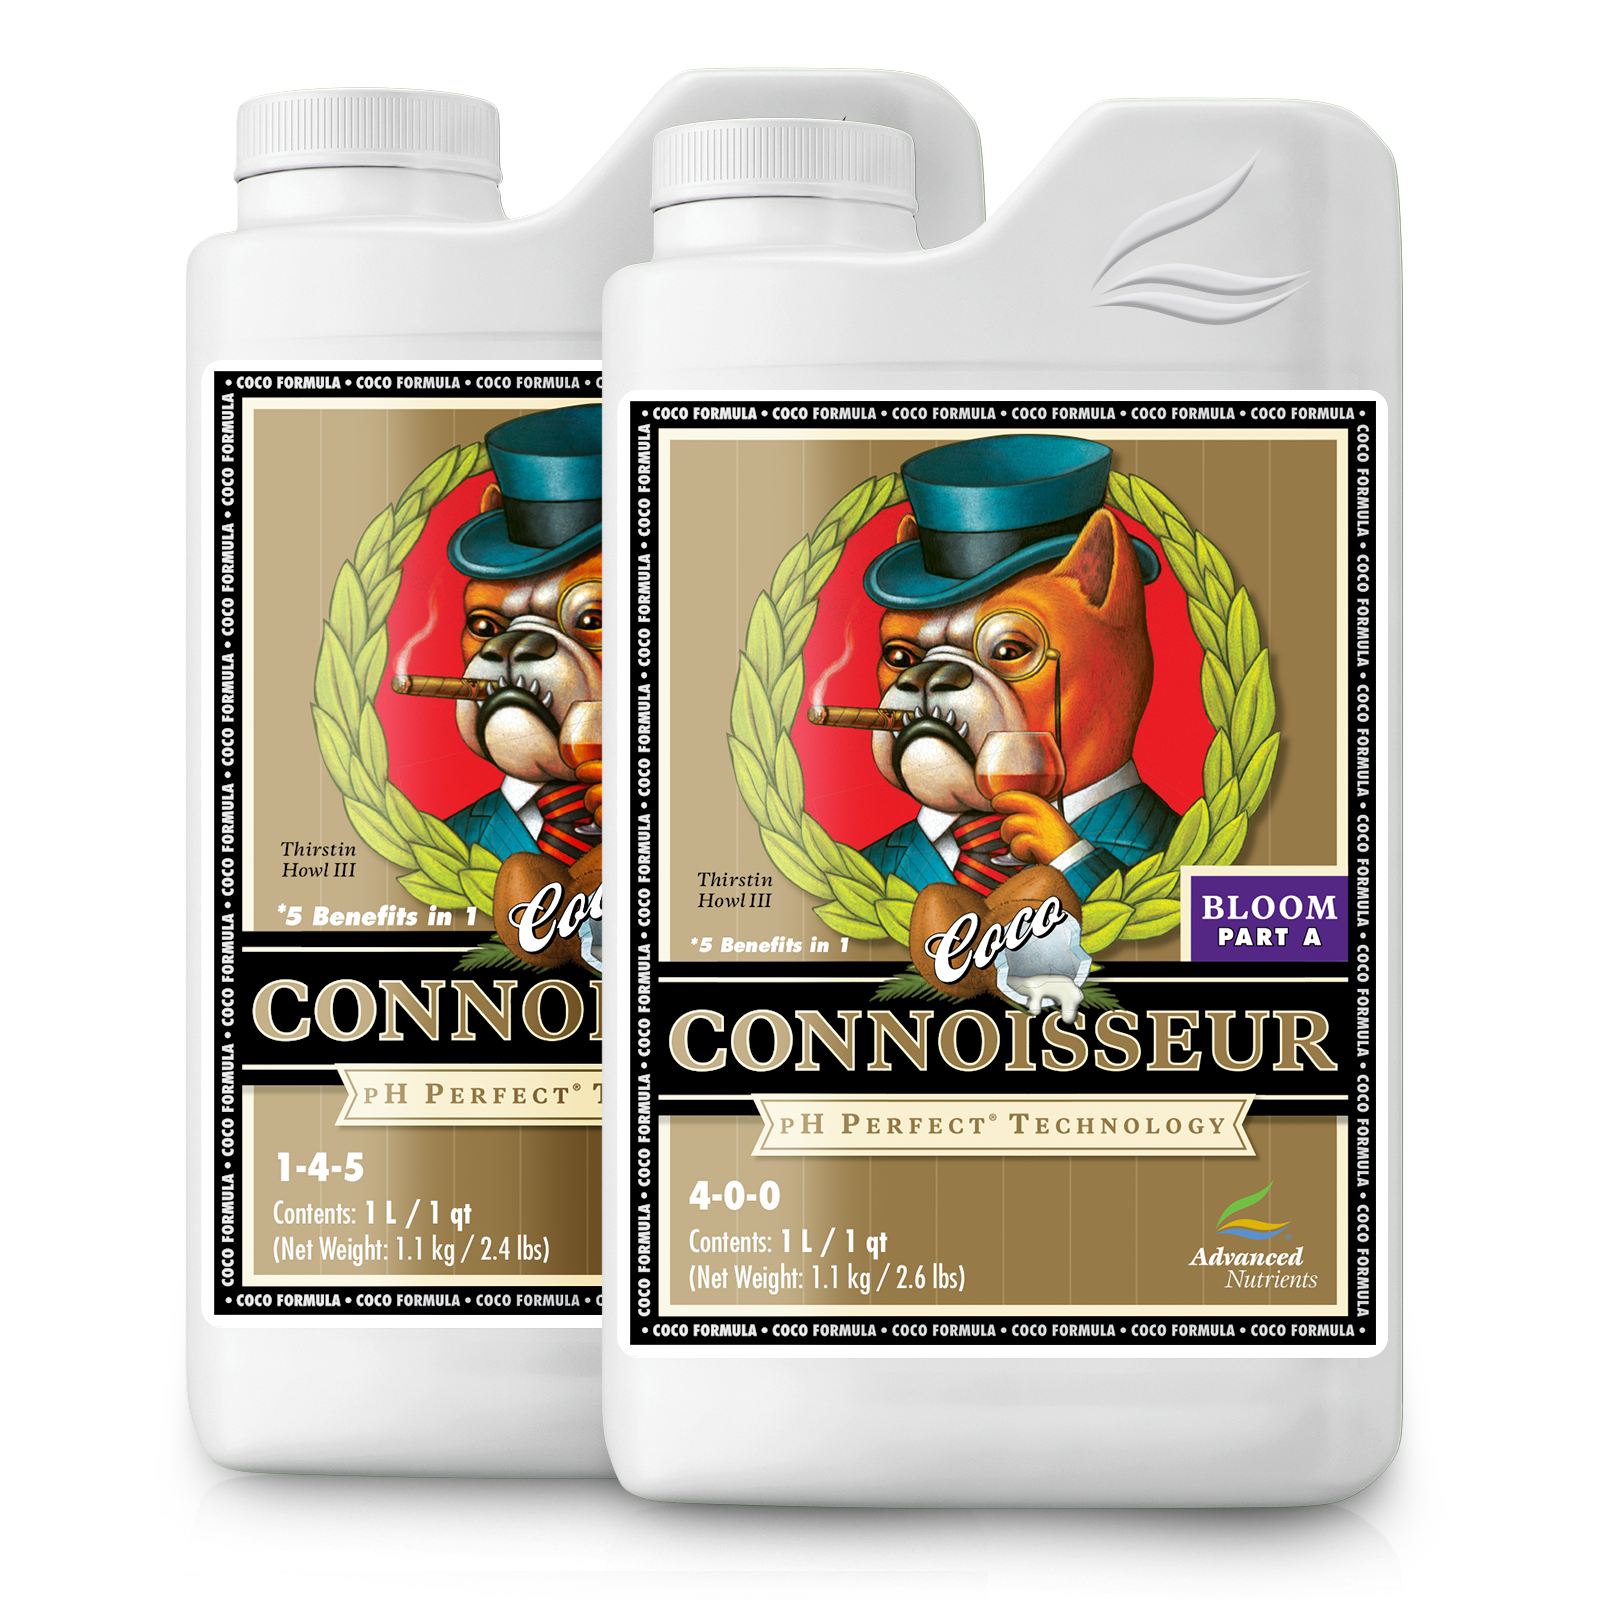 pH Perfect Connoisseur Coco Bloom Part B